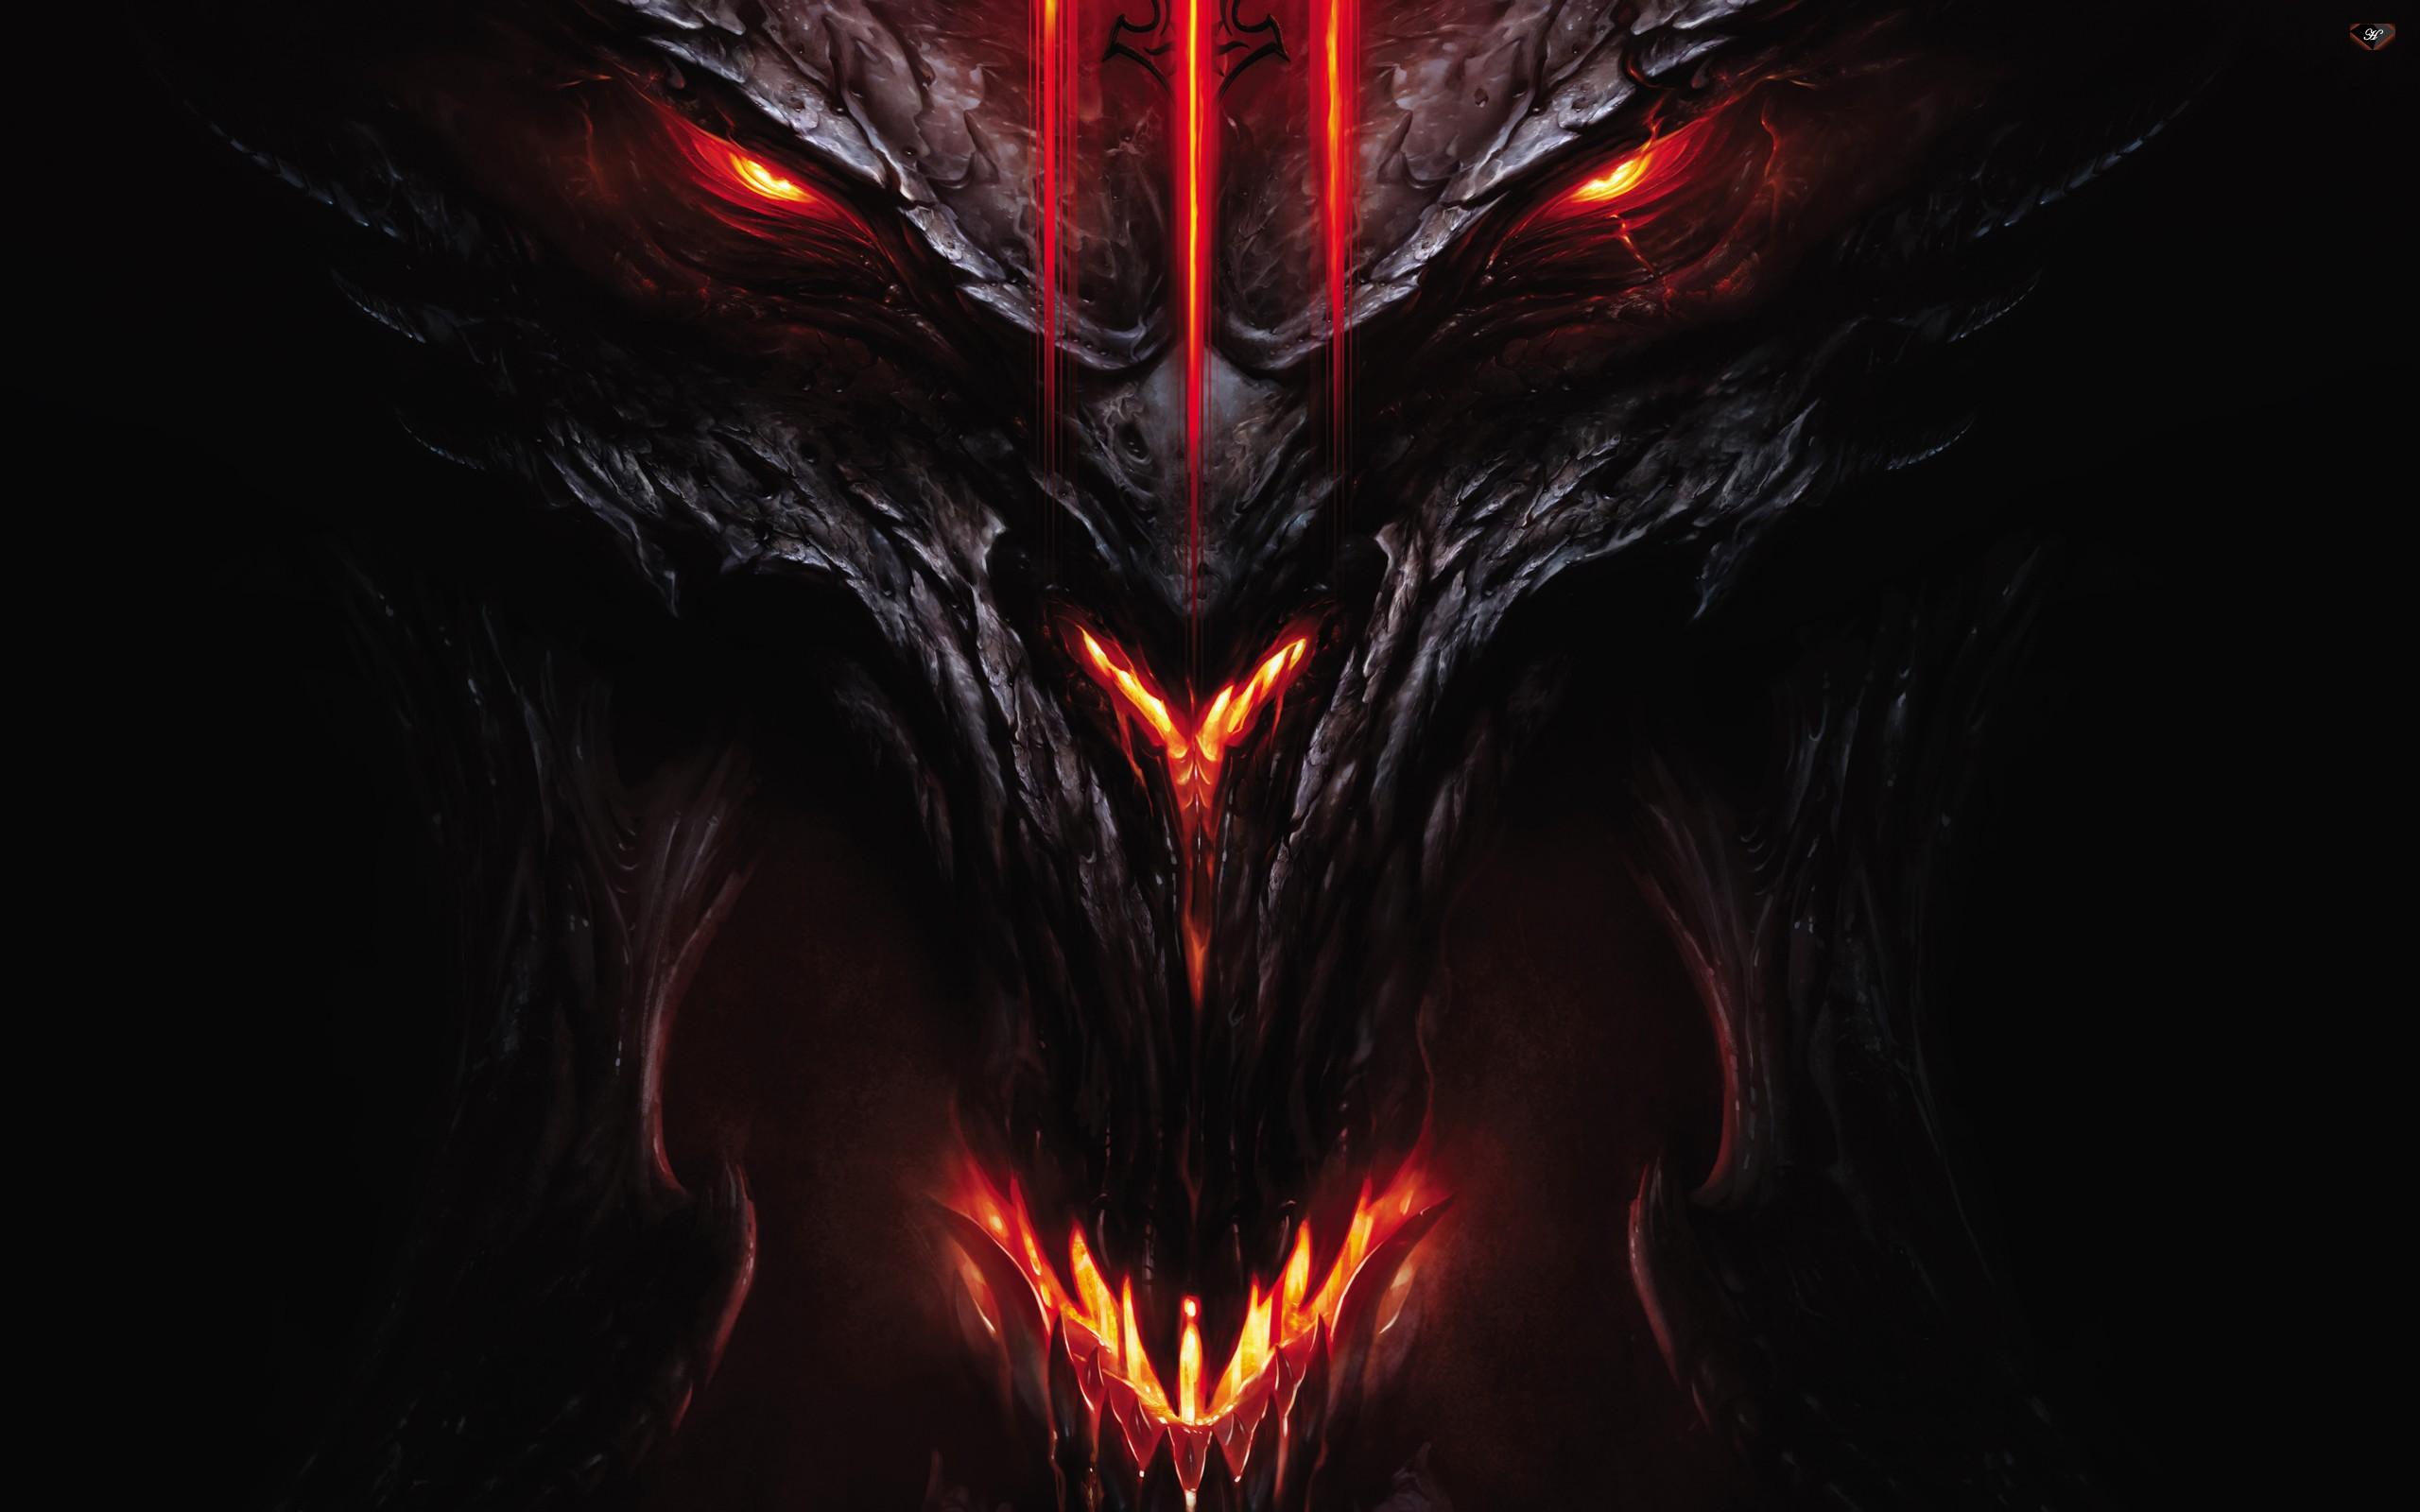 Diablo Wallpaper 1 Download Free Beautiful High Resolution